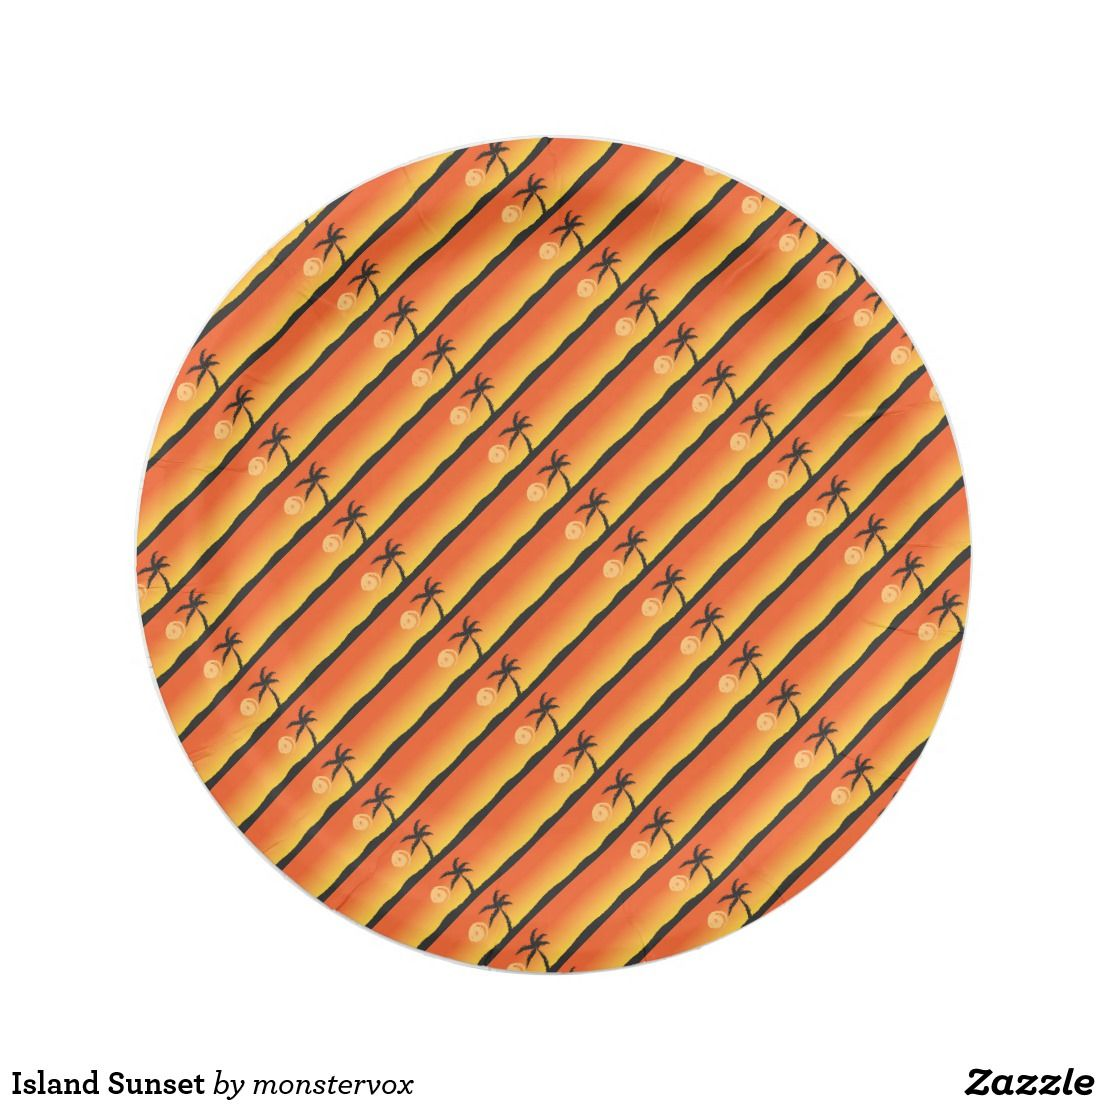 Island Sunset Paper Plate #Sunset #Island #PalmTree #Ocean #Beach #Party  sc 1 st  Pinterest & Island Sunset Paper Plate #Sunset #Island #PalmTree #Ocean #Beach ...